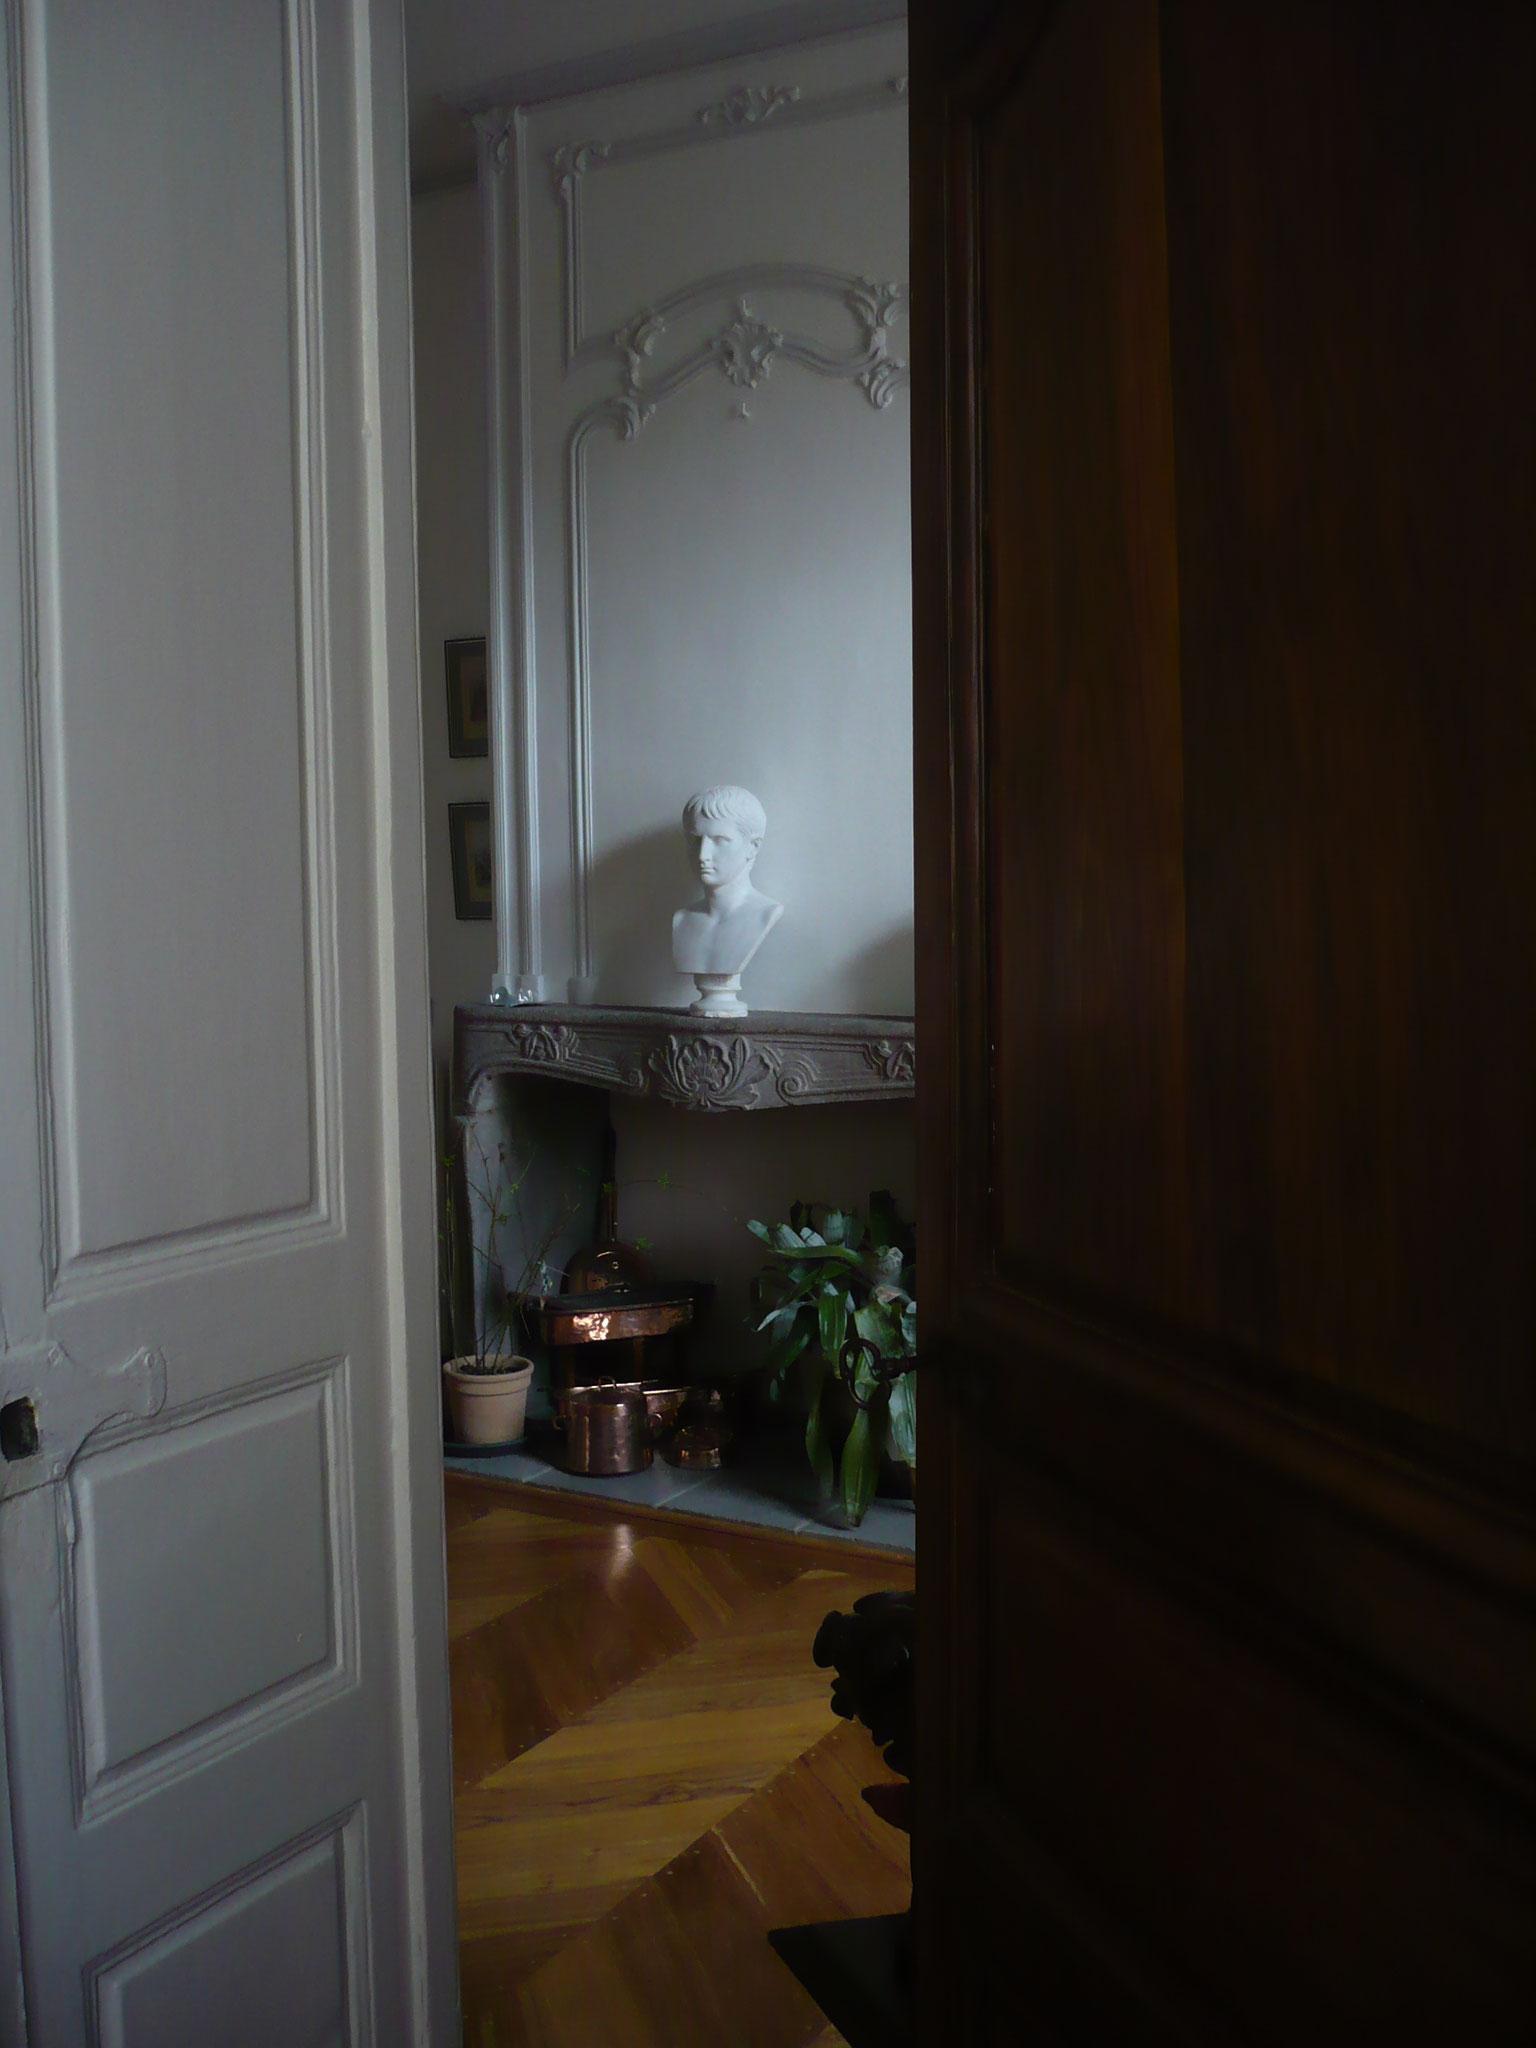 Chambres d h´tes  Riom 63 proche Clermont Ferrand Site de